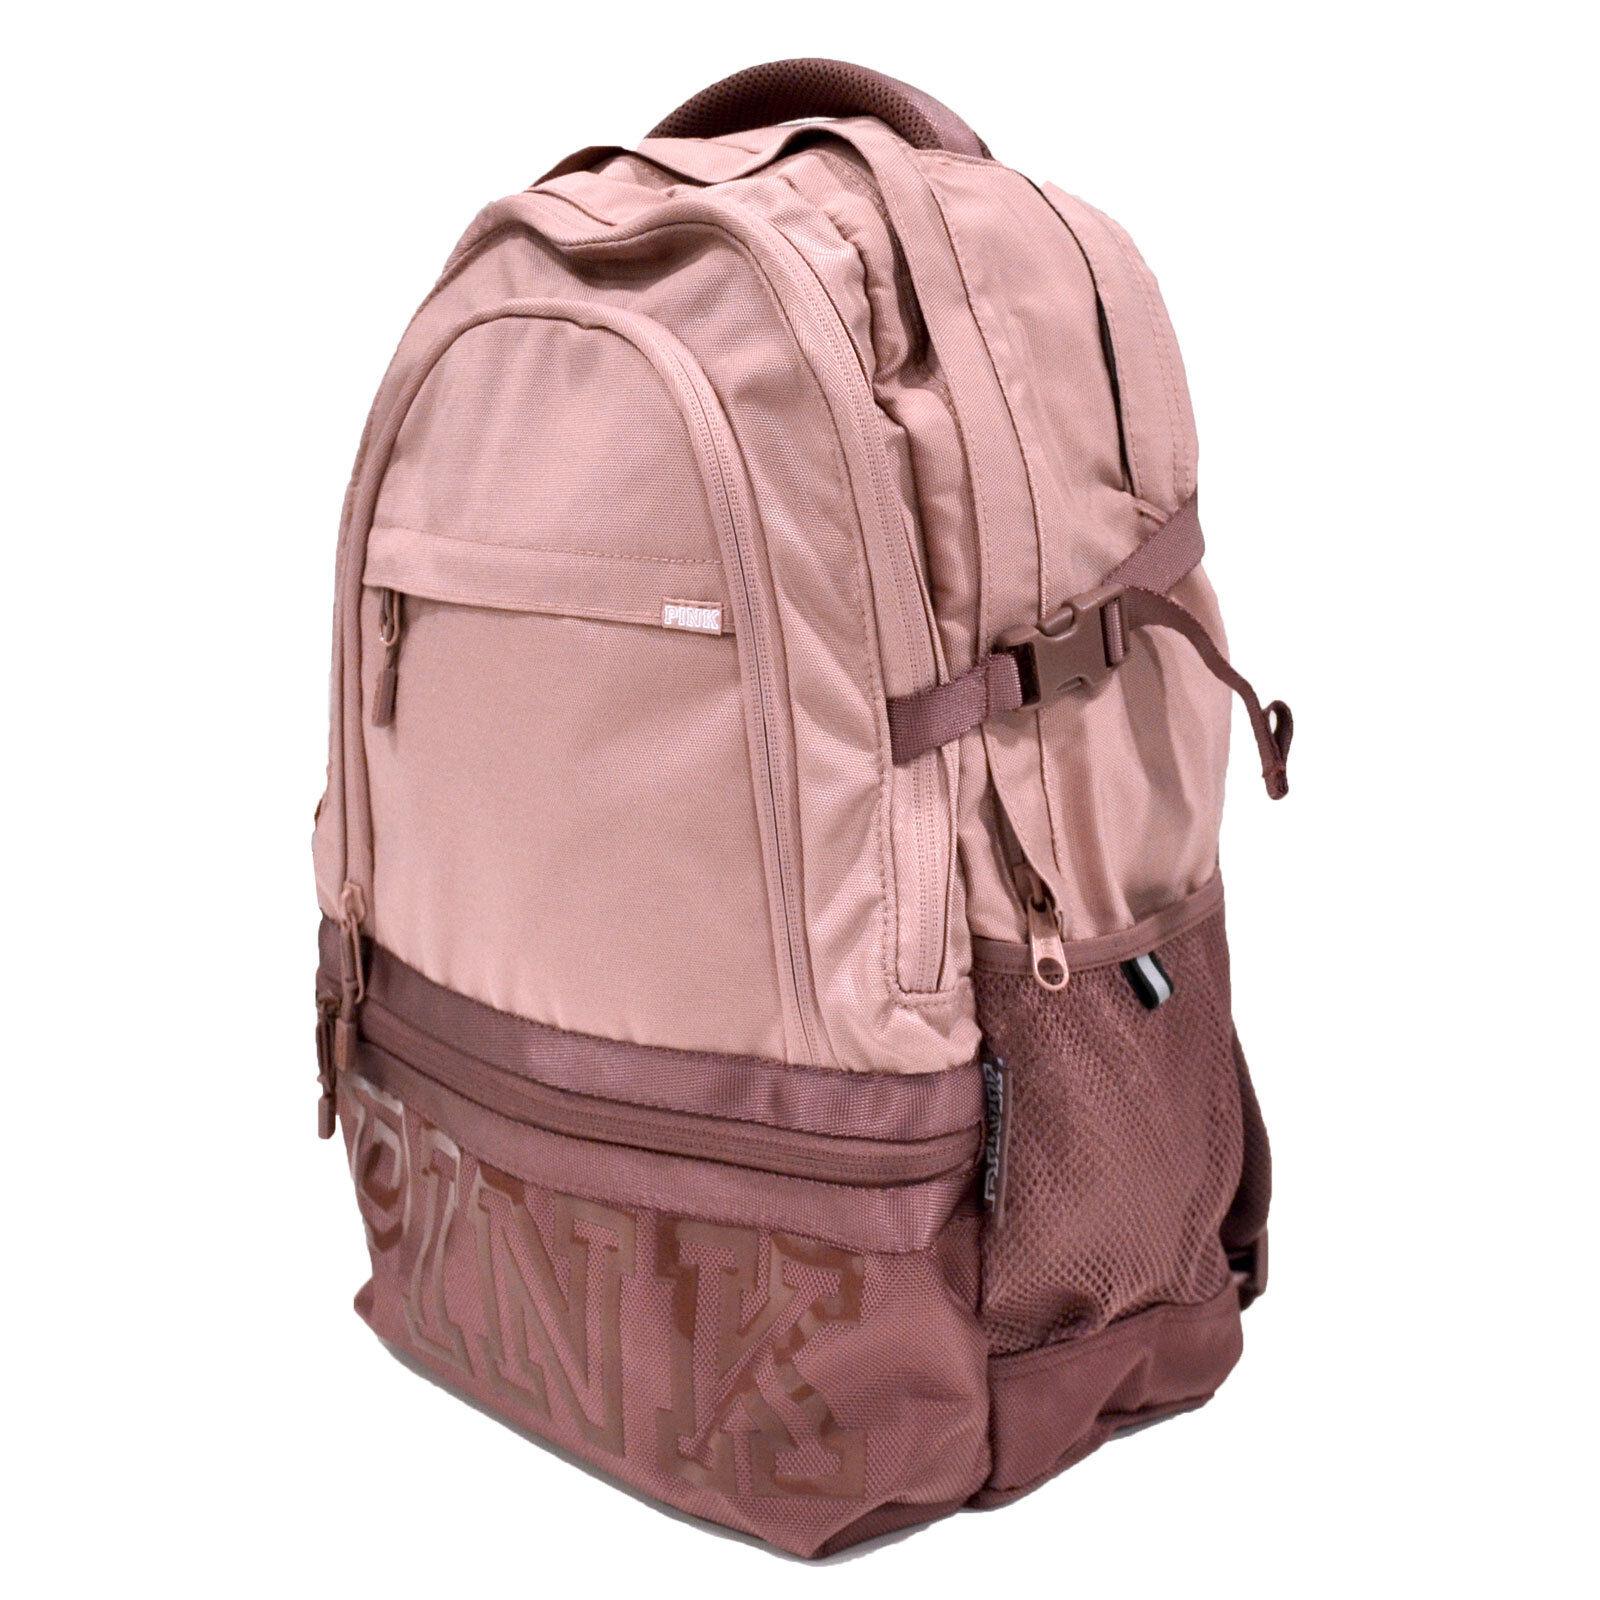 e17163e878 Collegiate Backpack Pink Review- Fenix Toulouse Handball